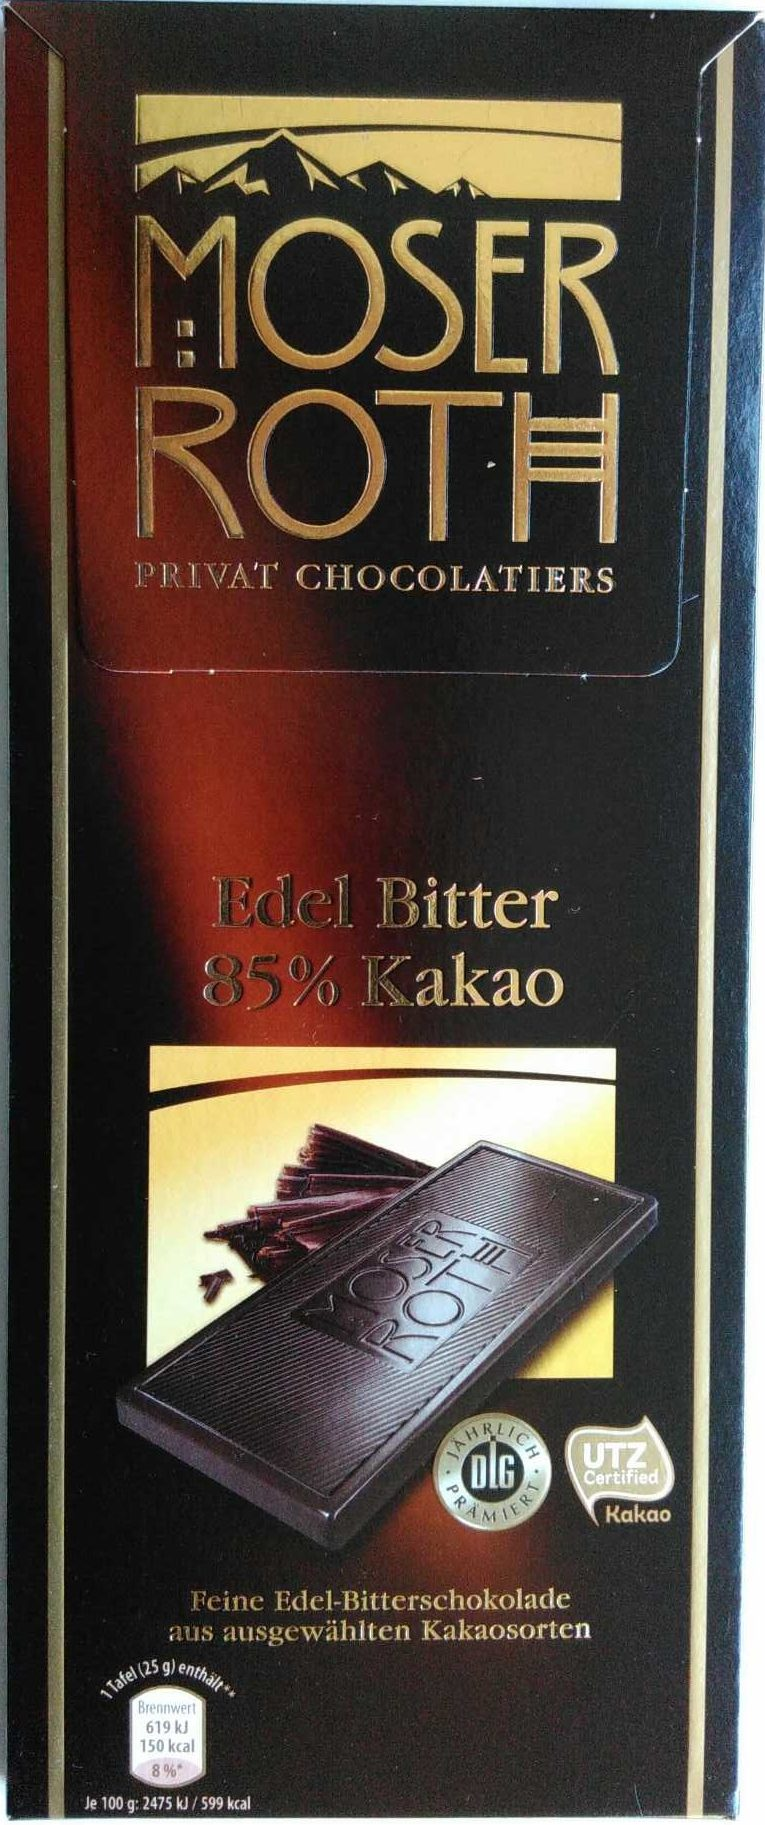 Edel Bitter 85% Kakao - Moser Roth - 125 g